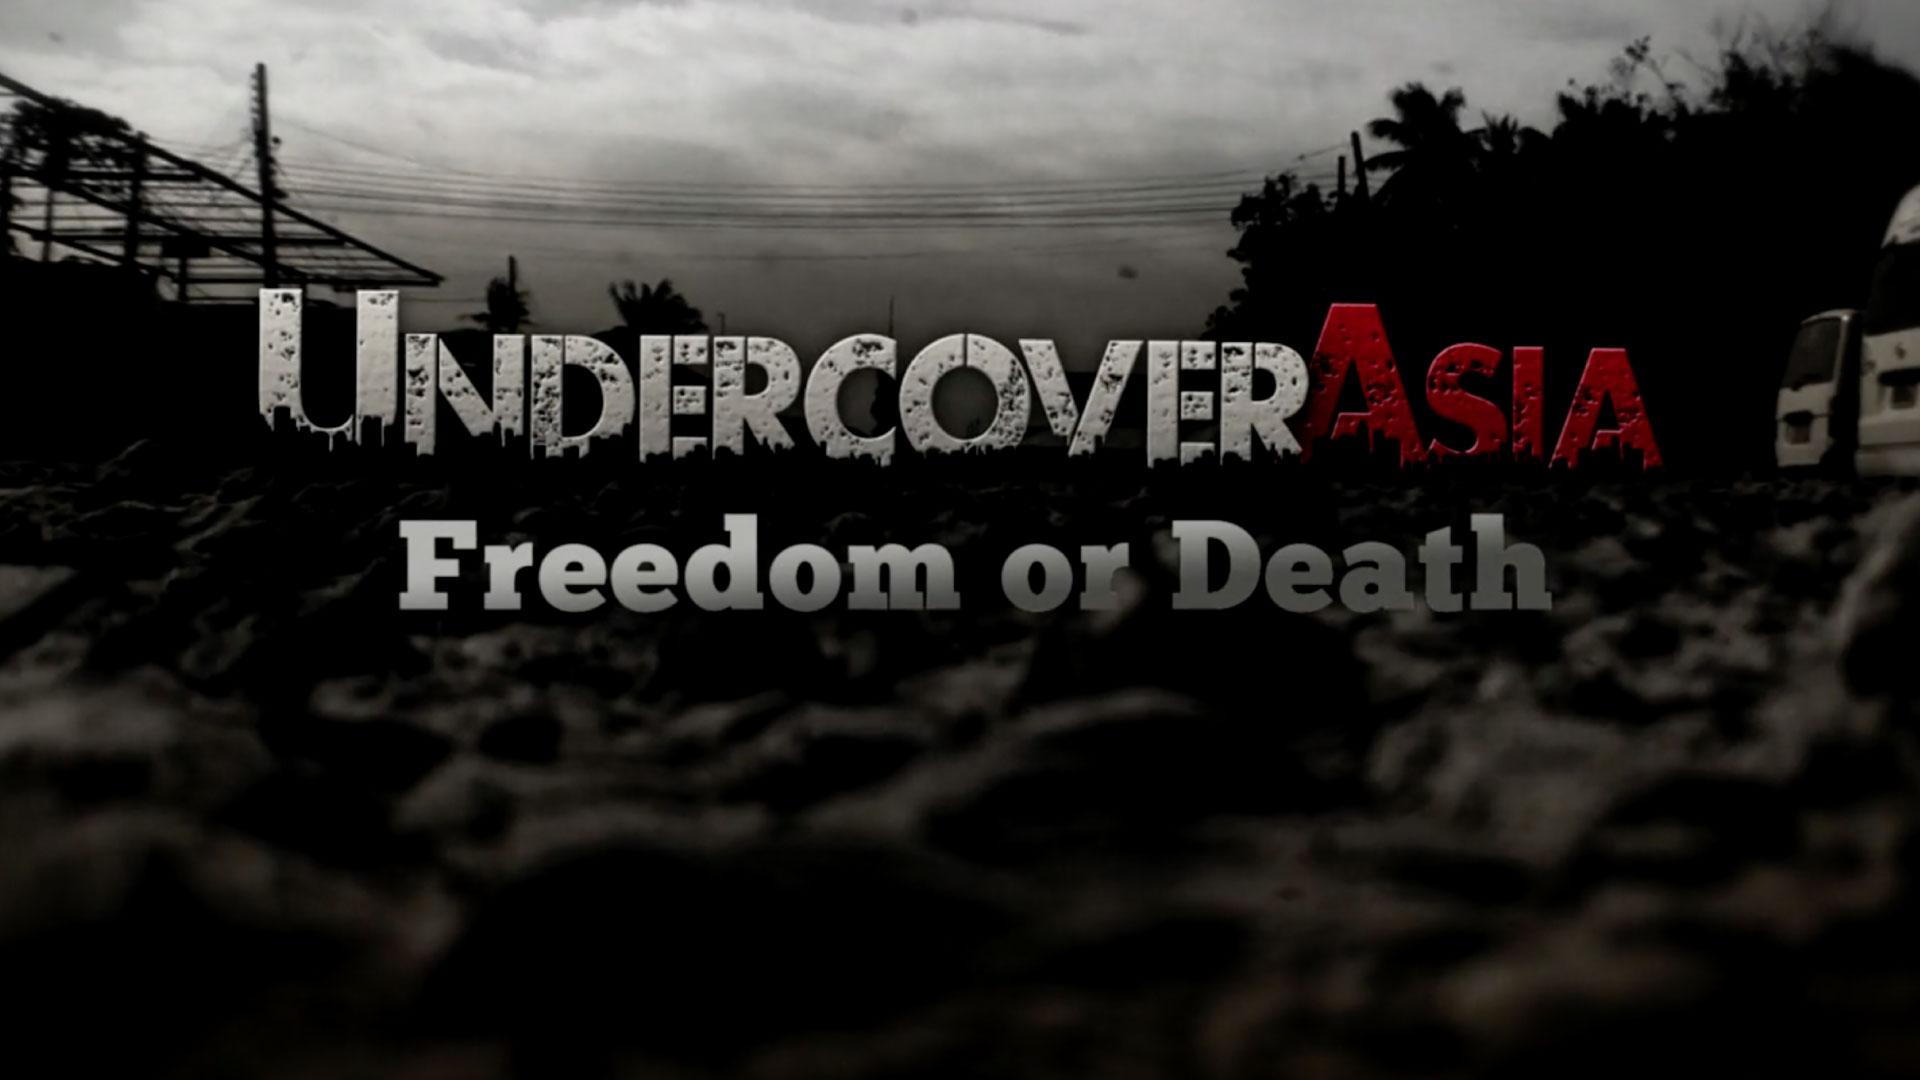 FREEDOM OR DEATH - SILVER | National/International Affairs 2015New York Festivals – World's Best Tv & Film